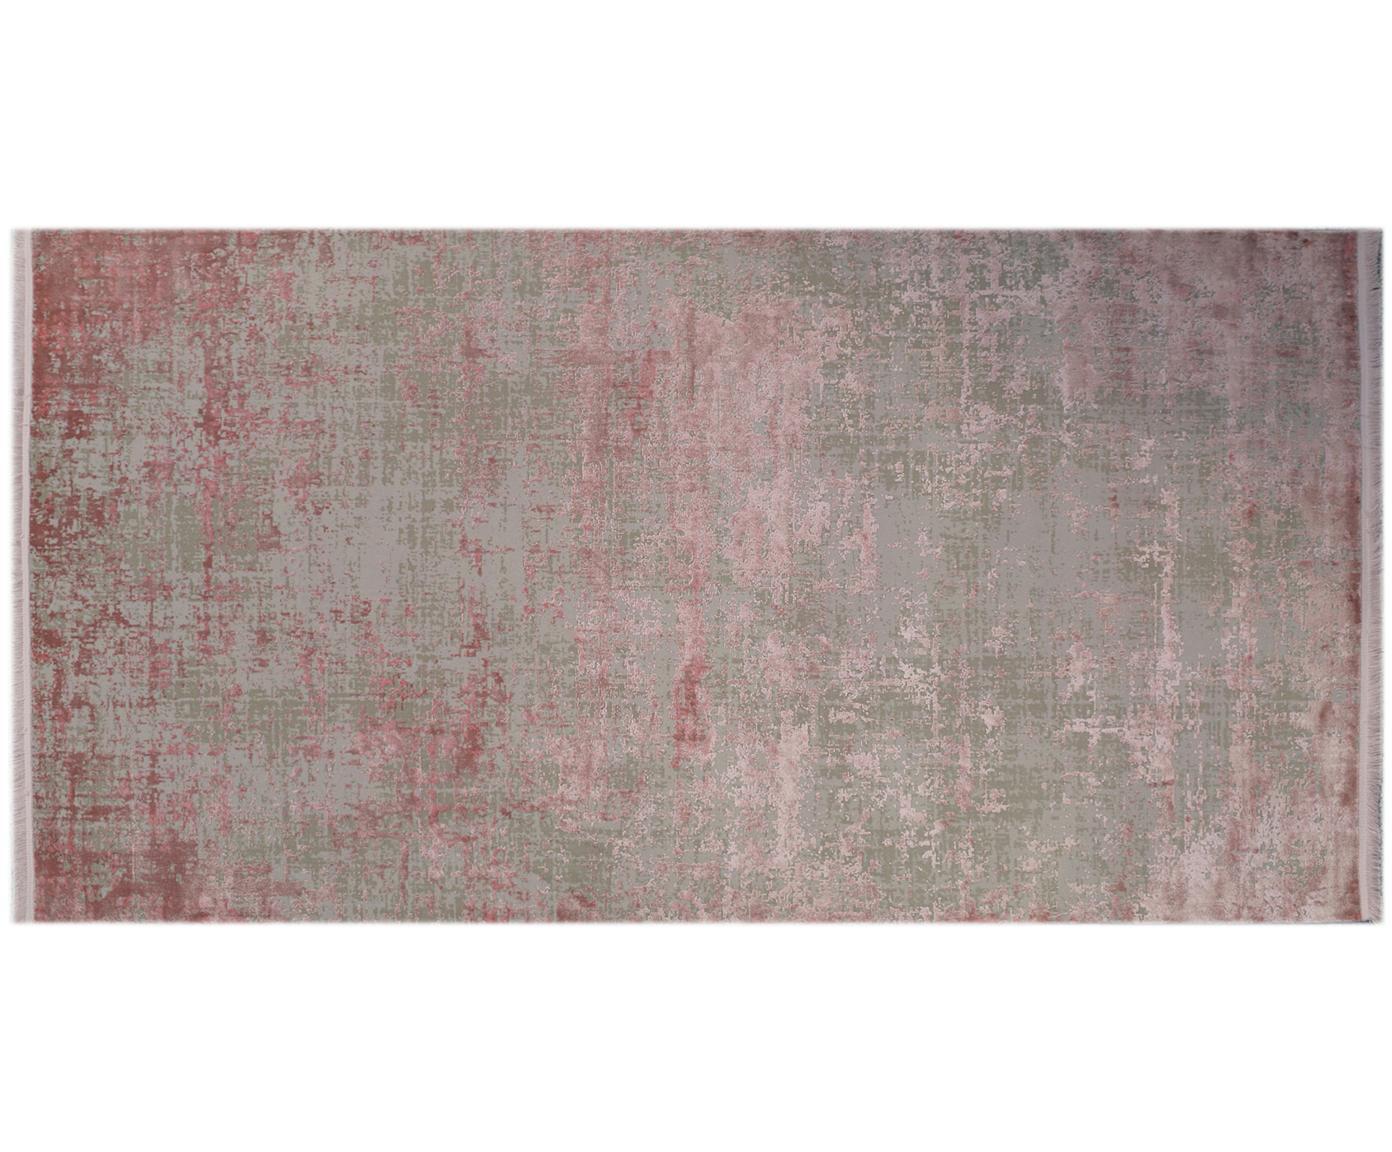 Schimmernder Teppich Cordoba mit Fransen, Vintage Style, Flor: 70% Acryl, 30% Viskose, Grau, Rosatöne, B 80 x L 150 cm (Grösse XS)